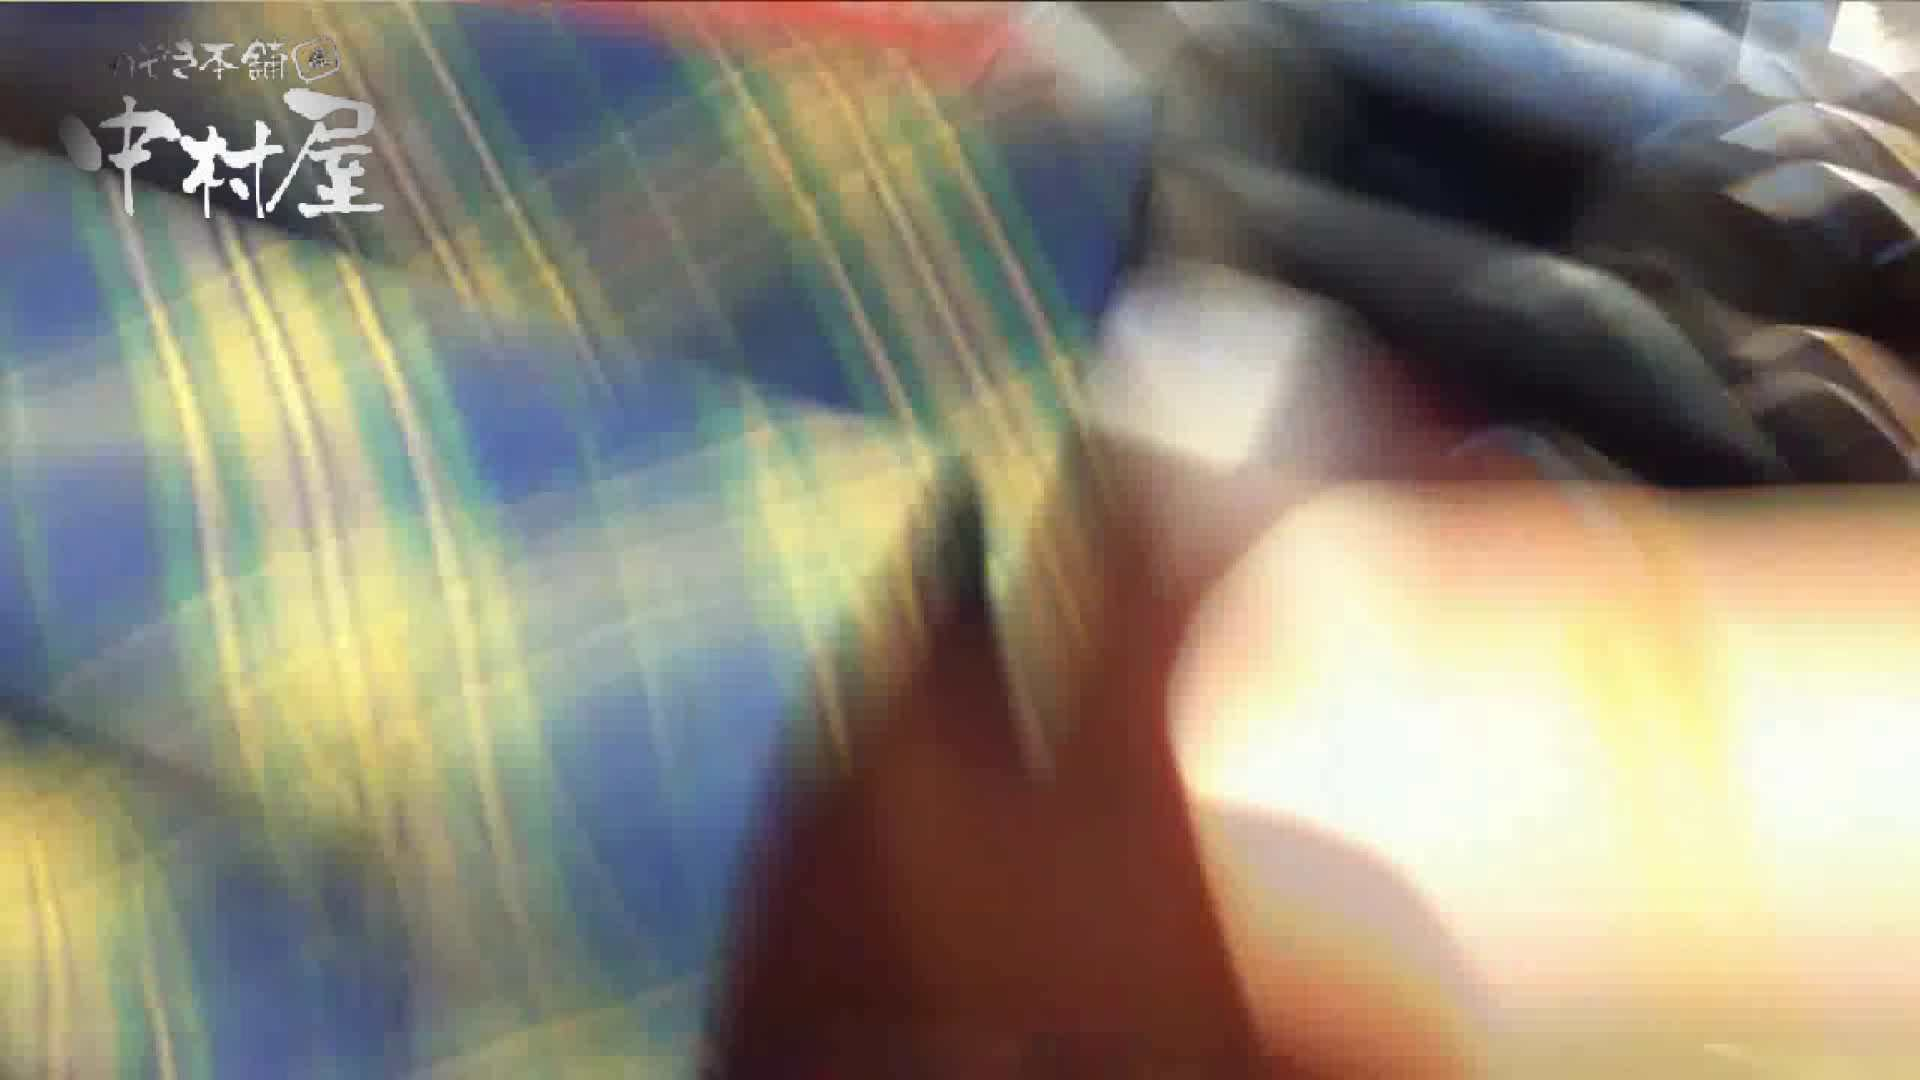 vol.52 美人アパレル胸チラ&パンチラ おとなしそうな店員の胸元にアタック! 接写 盗撮ワレメ無修正動画無料 86画像 28